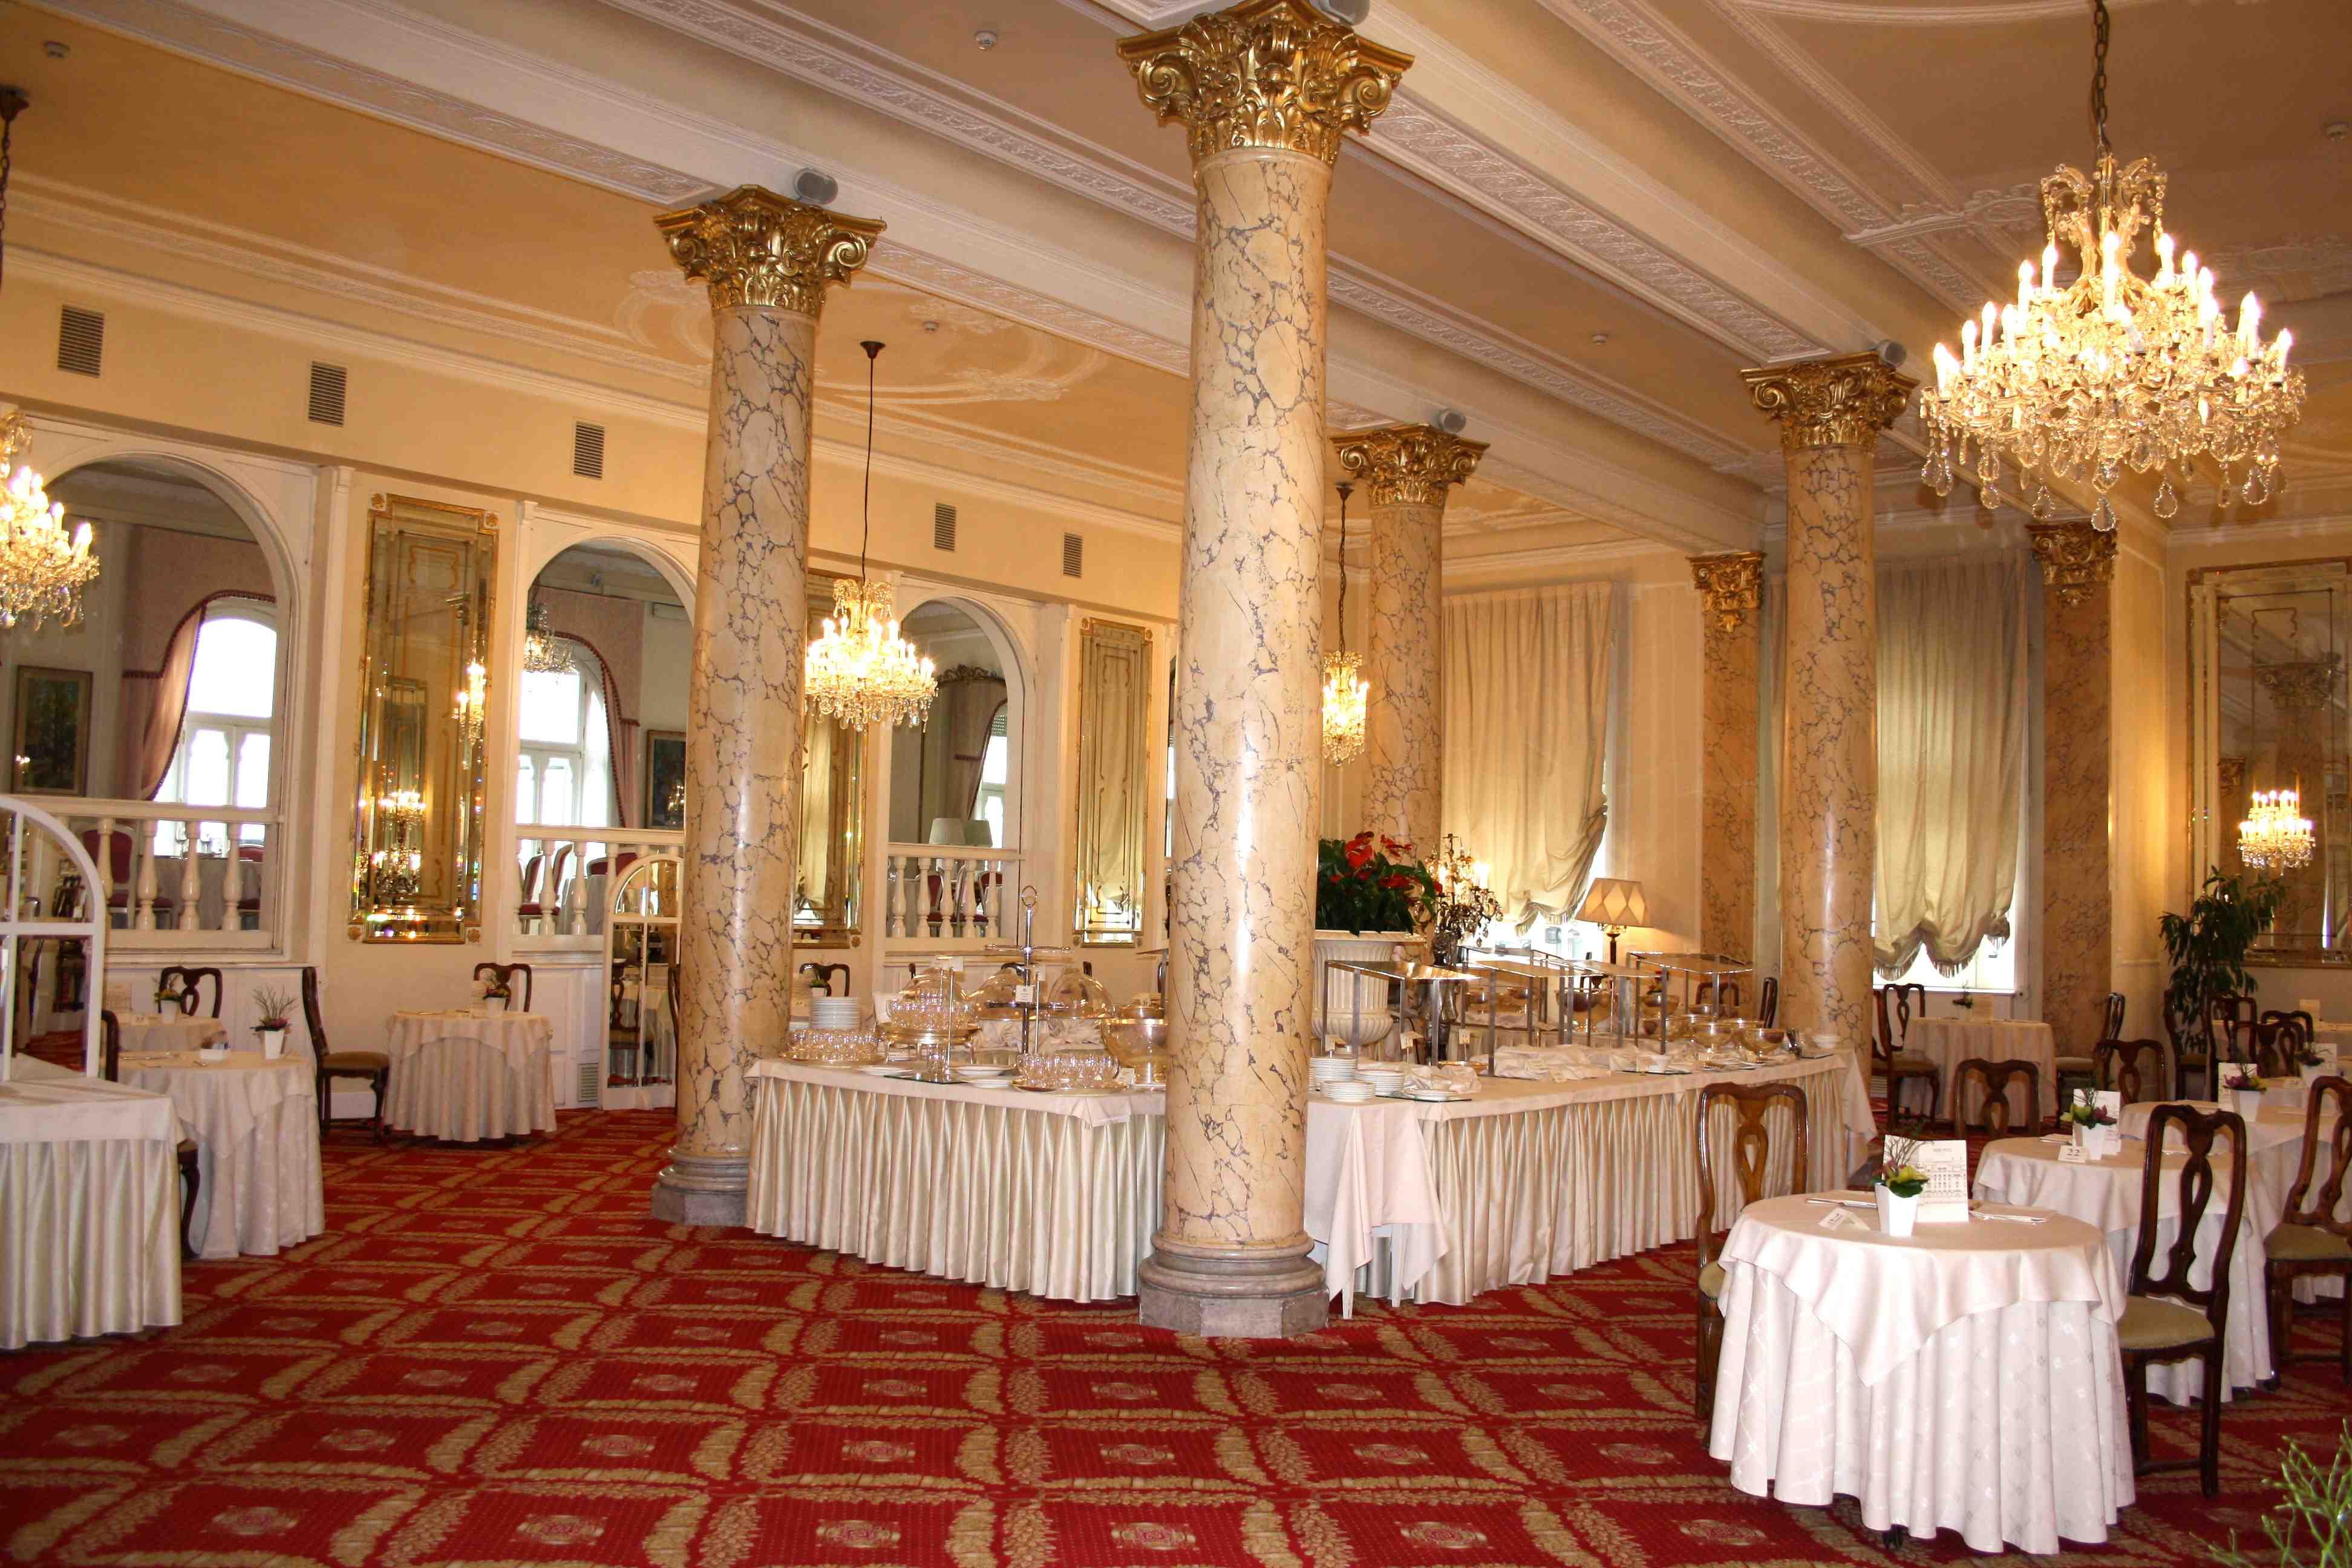 lampadari rimini : special weekend@Grand Hotel Rimini Le Jour du Oui